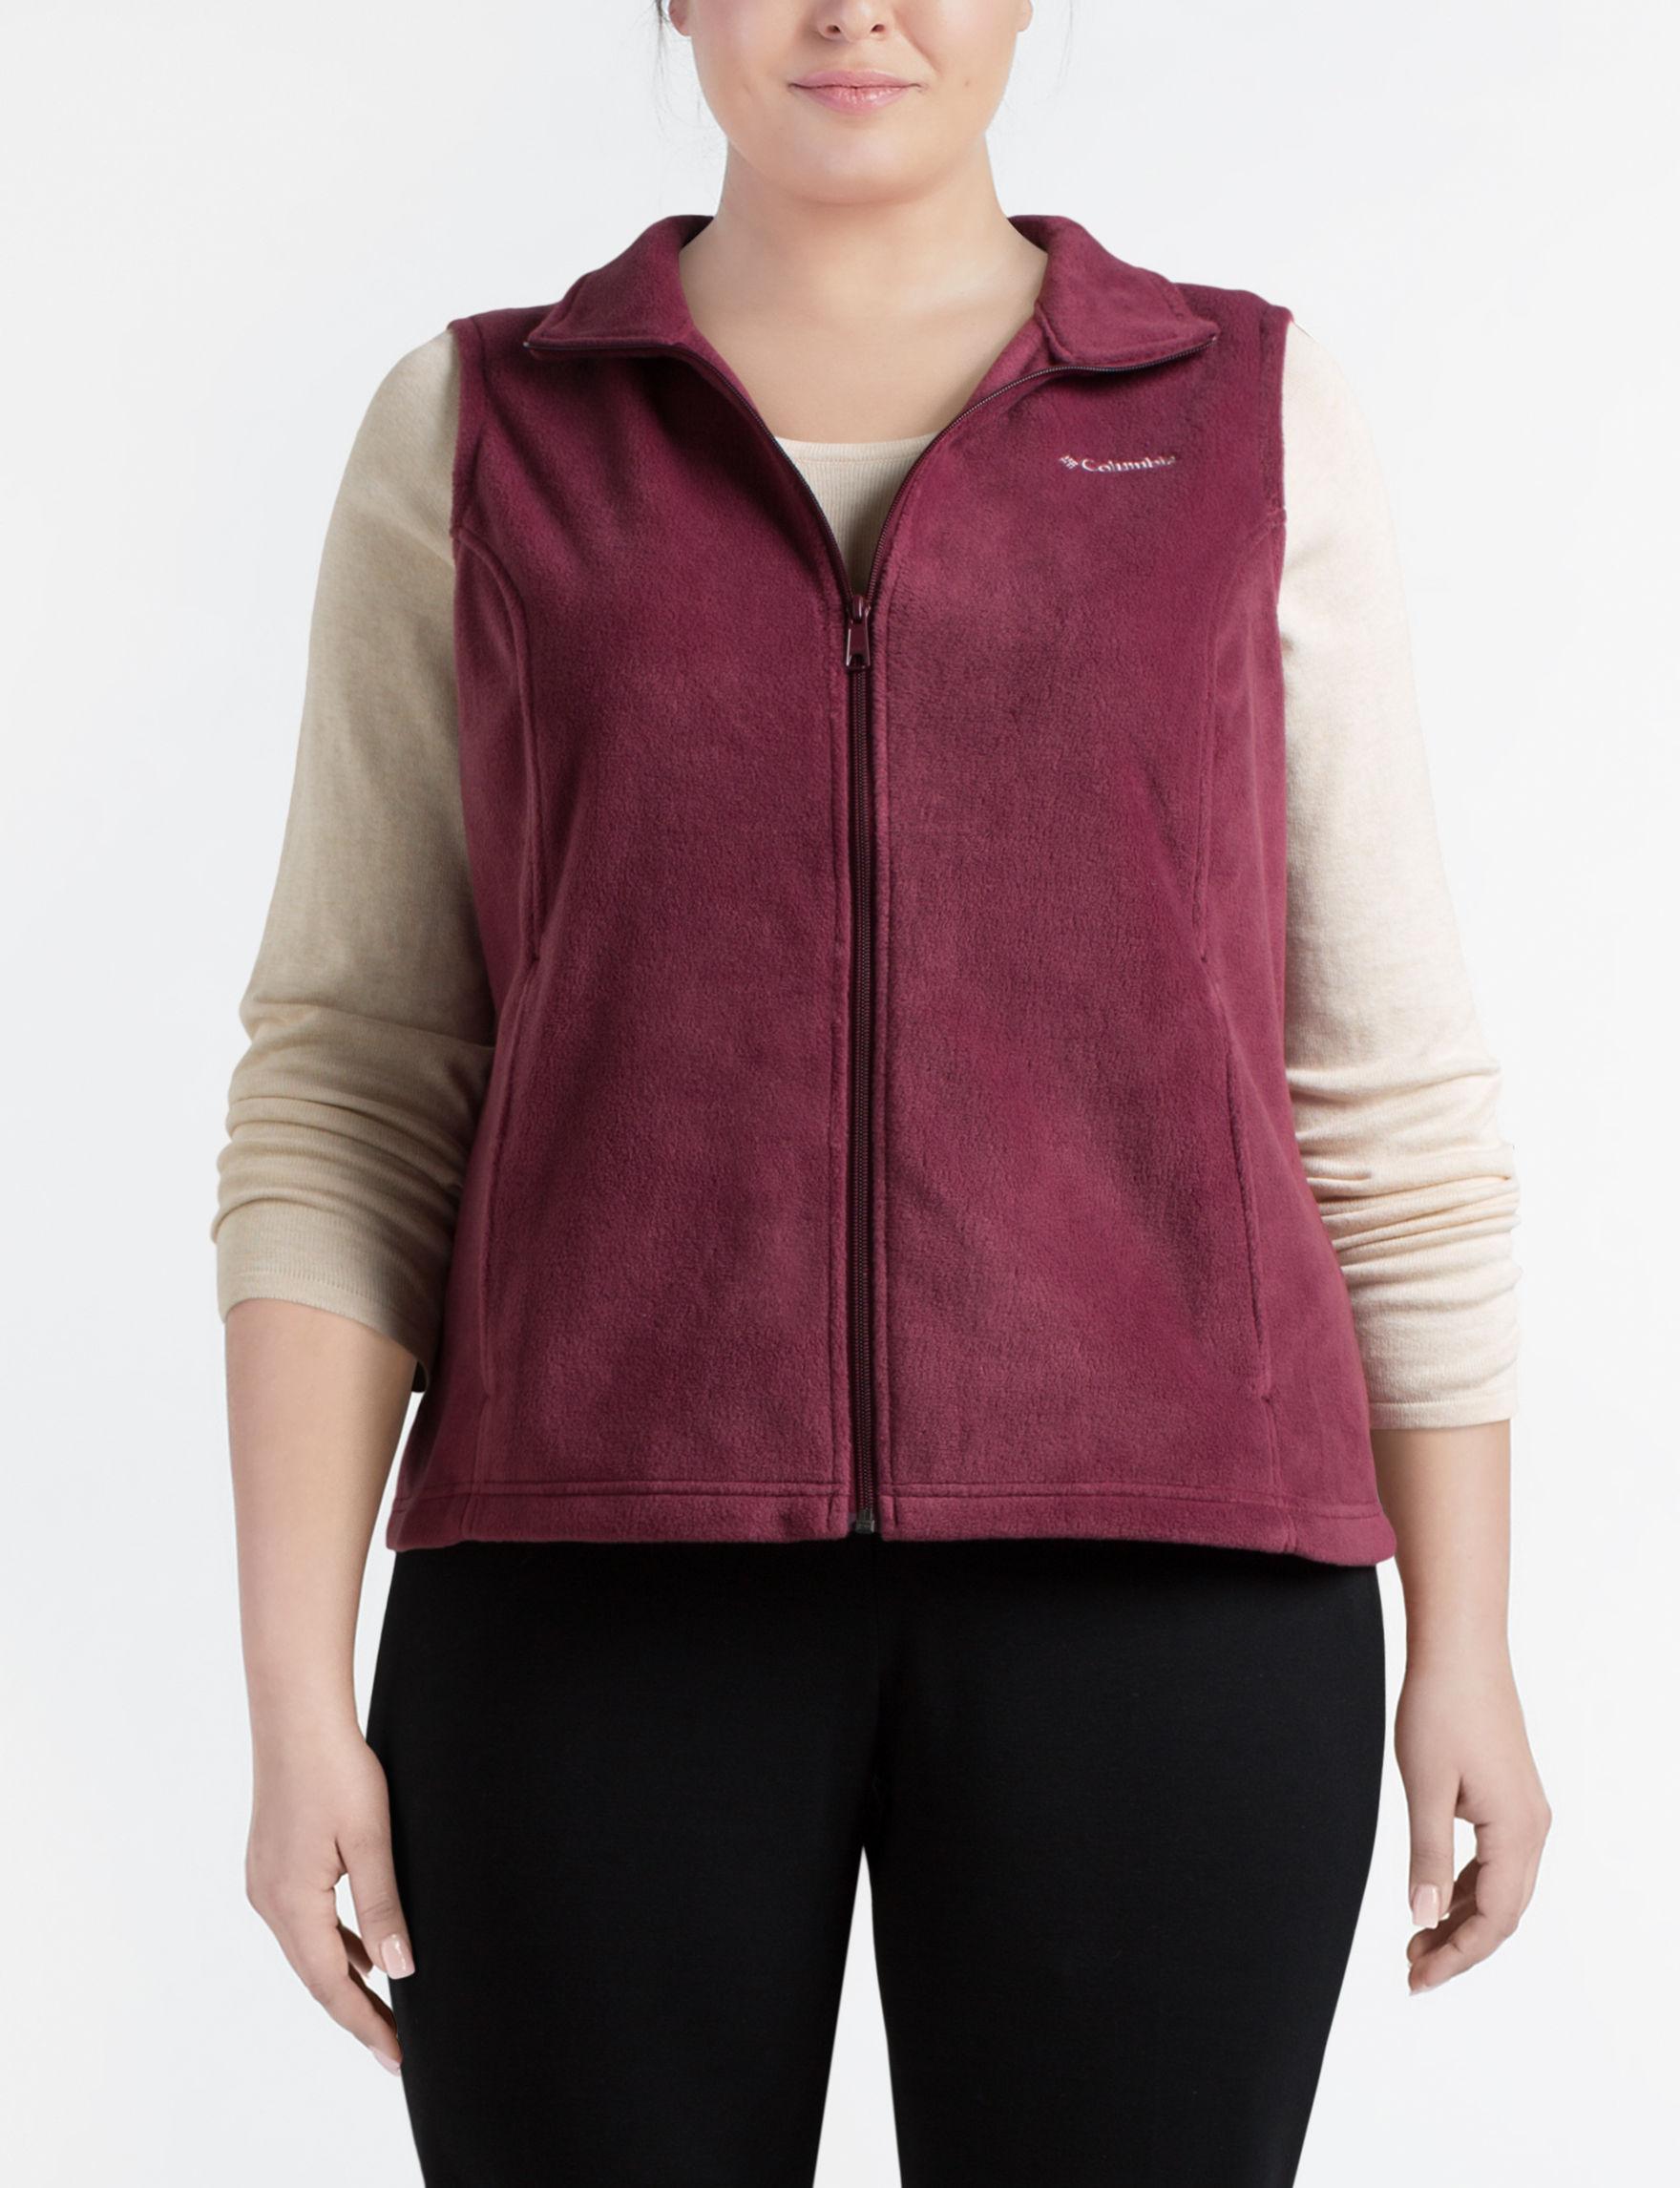 Columbia Maroon Fleece & Soft Shell Jackets Lightweight Jackets & Blazers